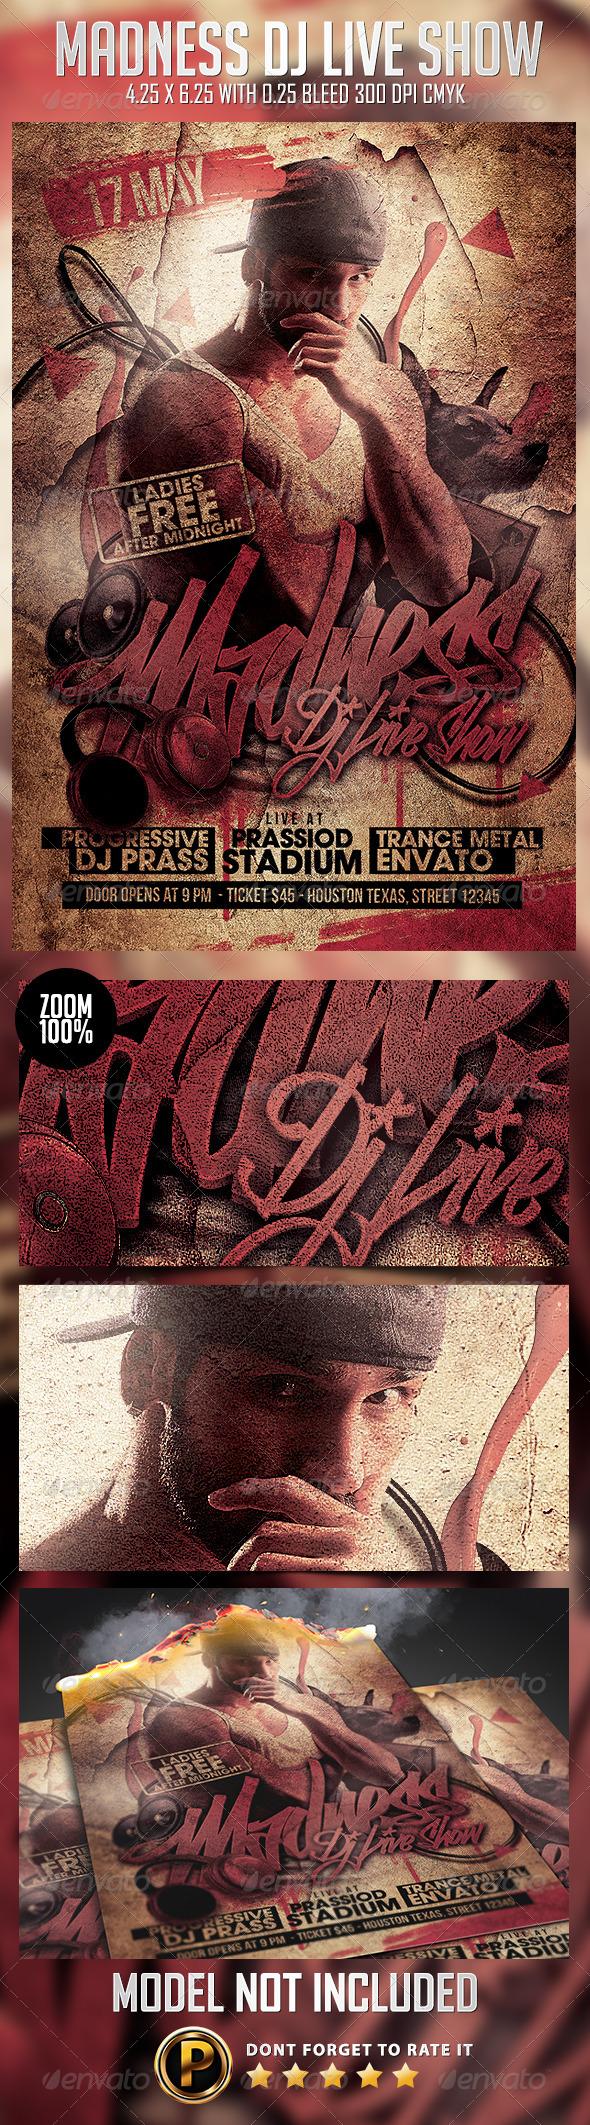 Madness Dj Live Show Flyer Template